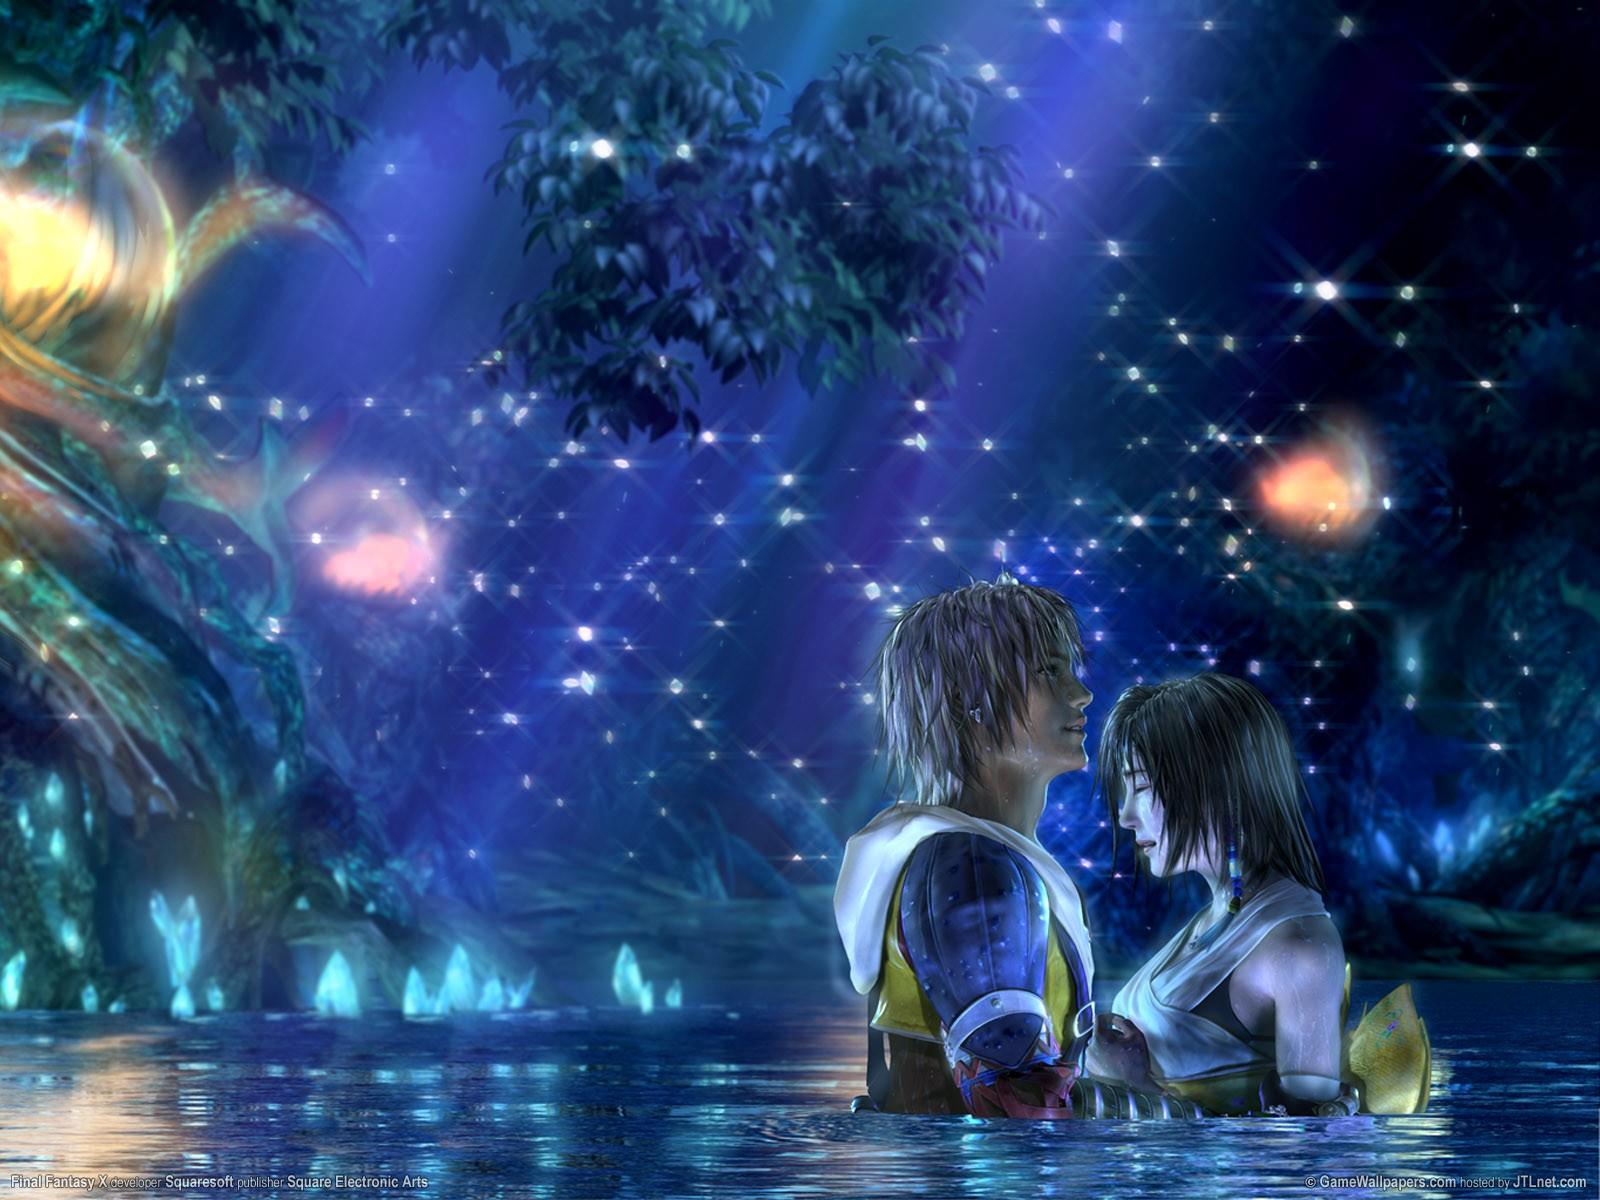 http://1.bp.blogspot.com/_Uf42tA7xWWA/S883RUX4cXI/AAAAAAAABTM/__BsVUKYmt8/s1600/Final-Fantasy-X-Night-Sky-881.jpg